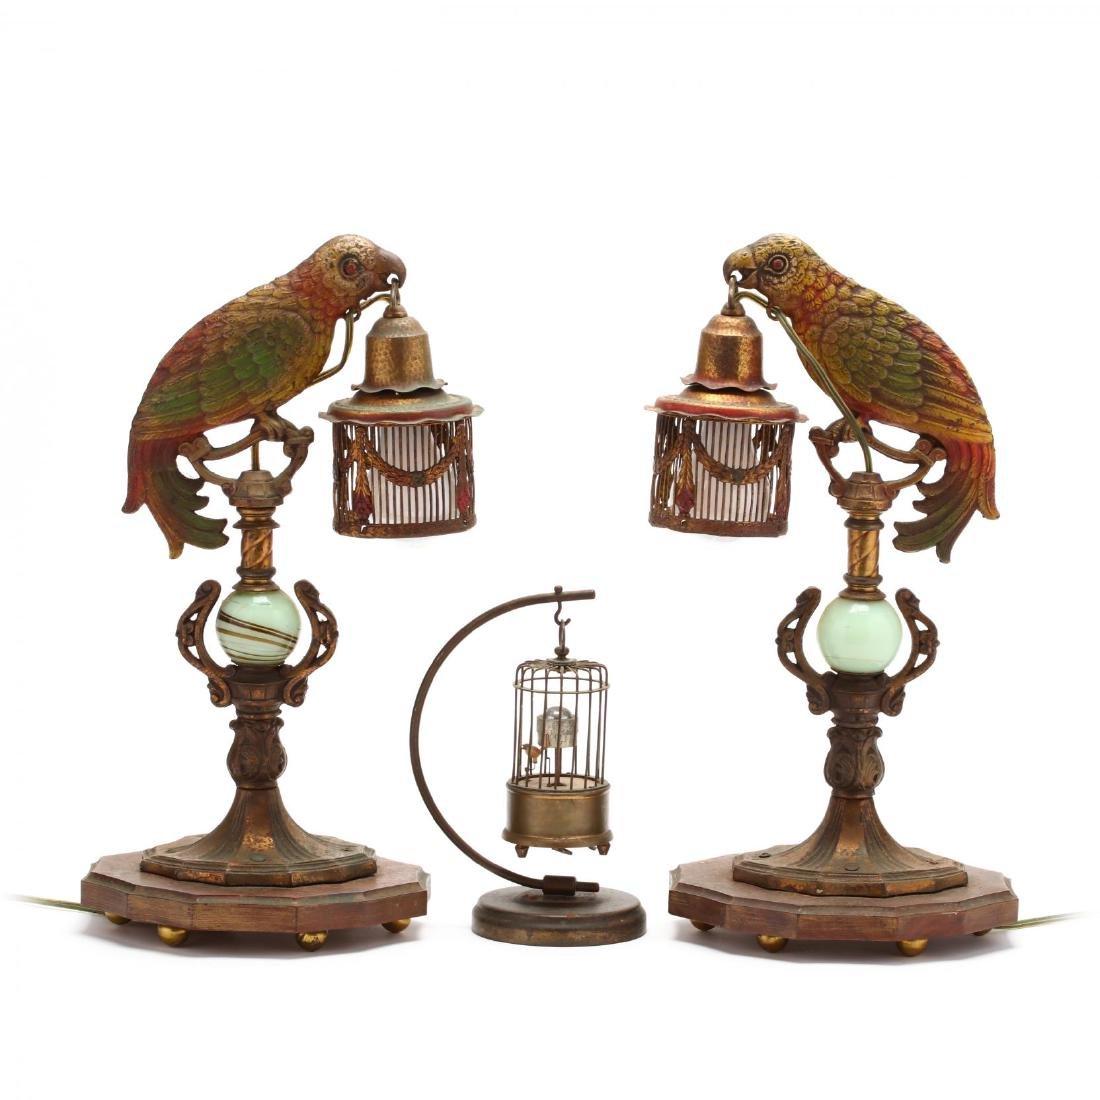 Pair of Art Deco Parrot Boudoir Lamps and an Automaton